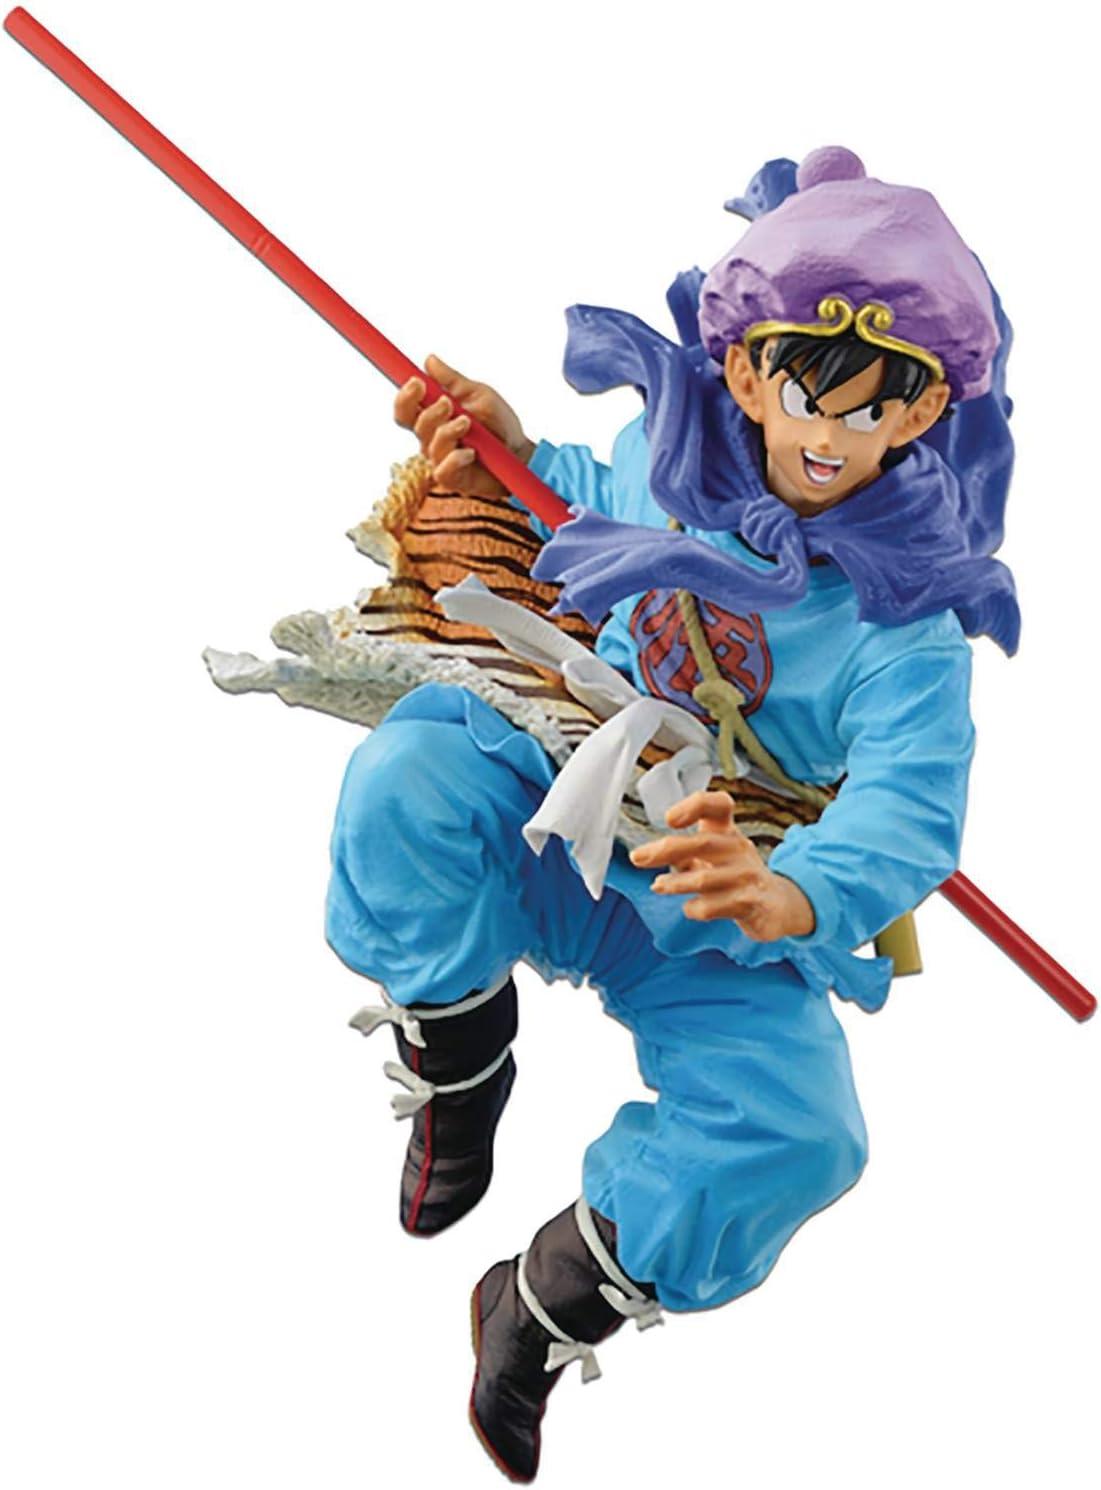 Figurine DBZ Banpresto Son Goku Colosseum 14cm 4983164163322